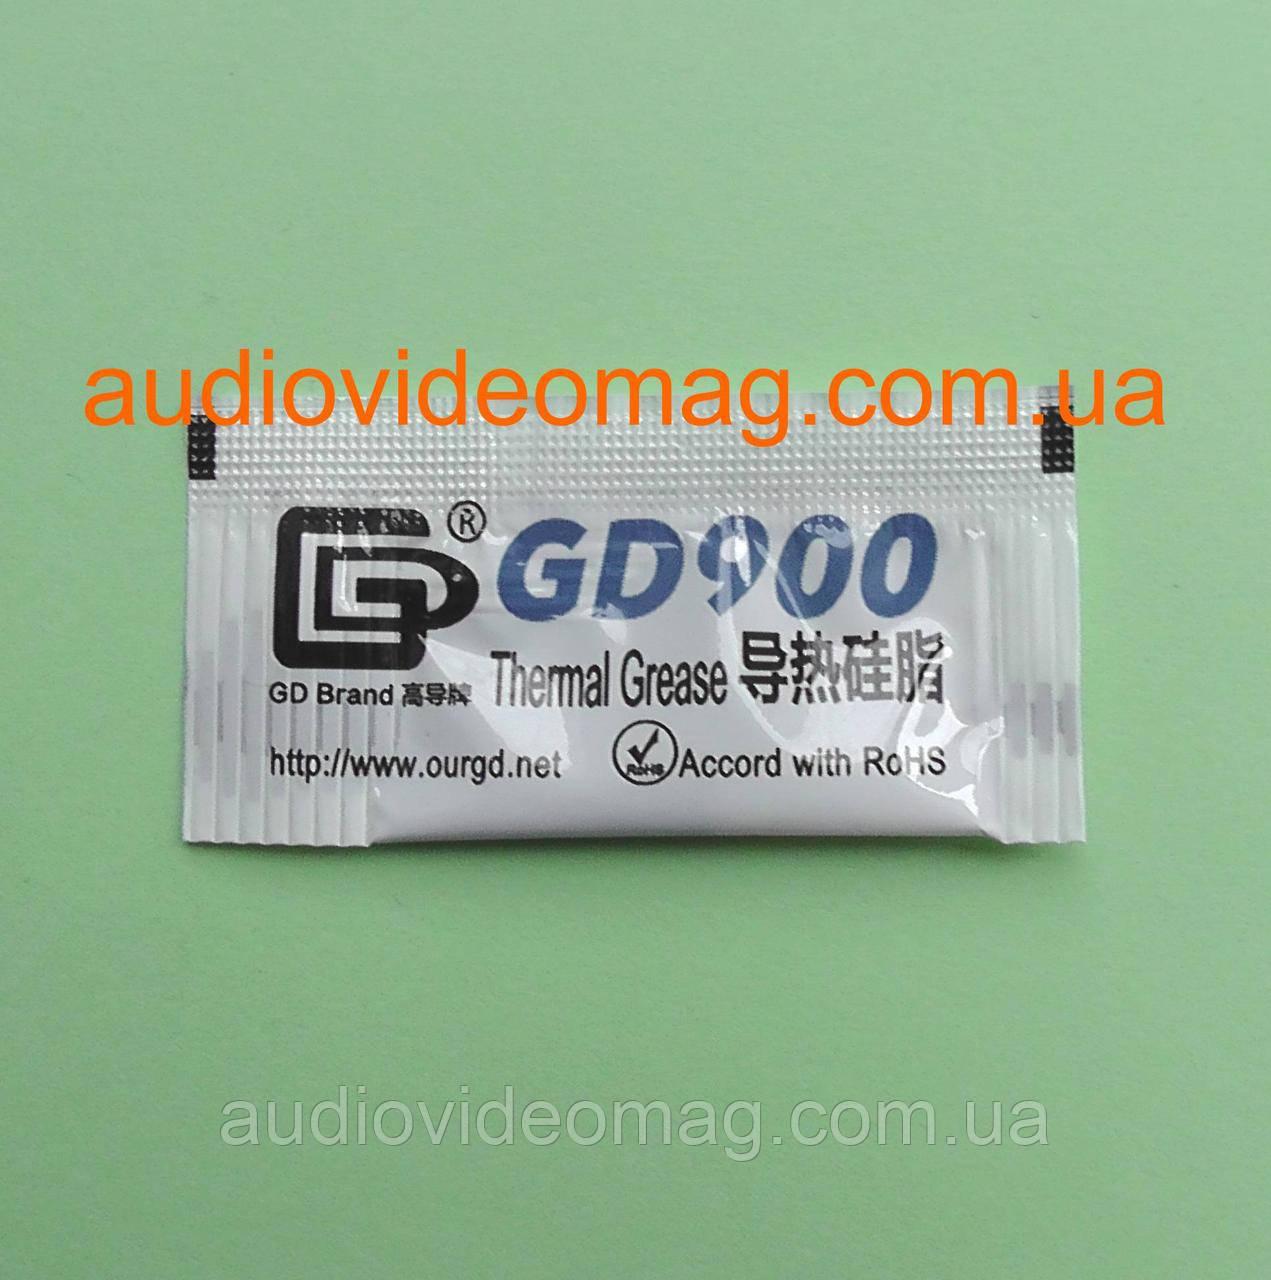 Термопаста Termal Grease GD900 (К/т > 4,8W/m-k), вес 0.5 грамм